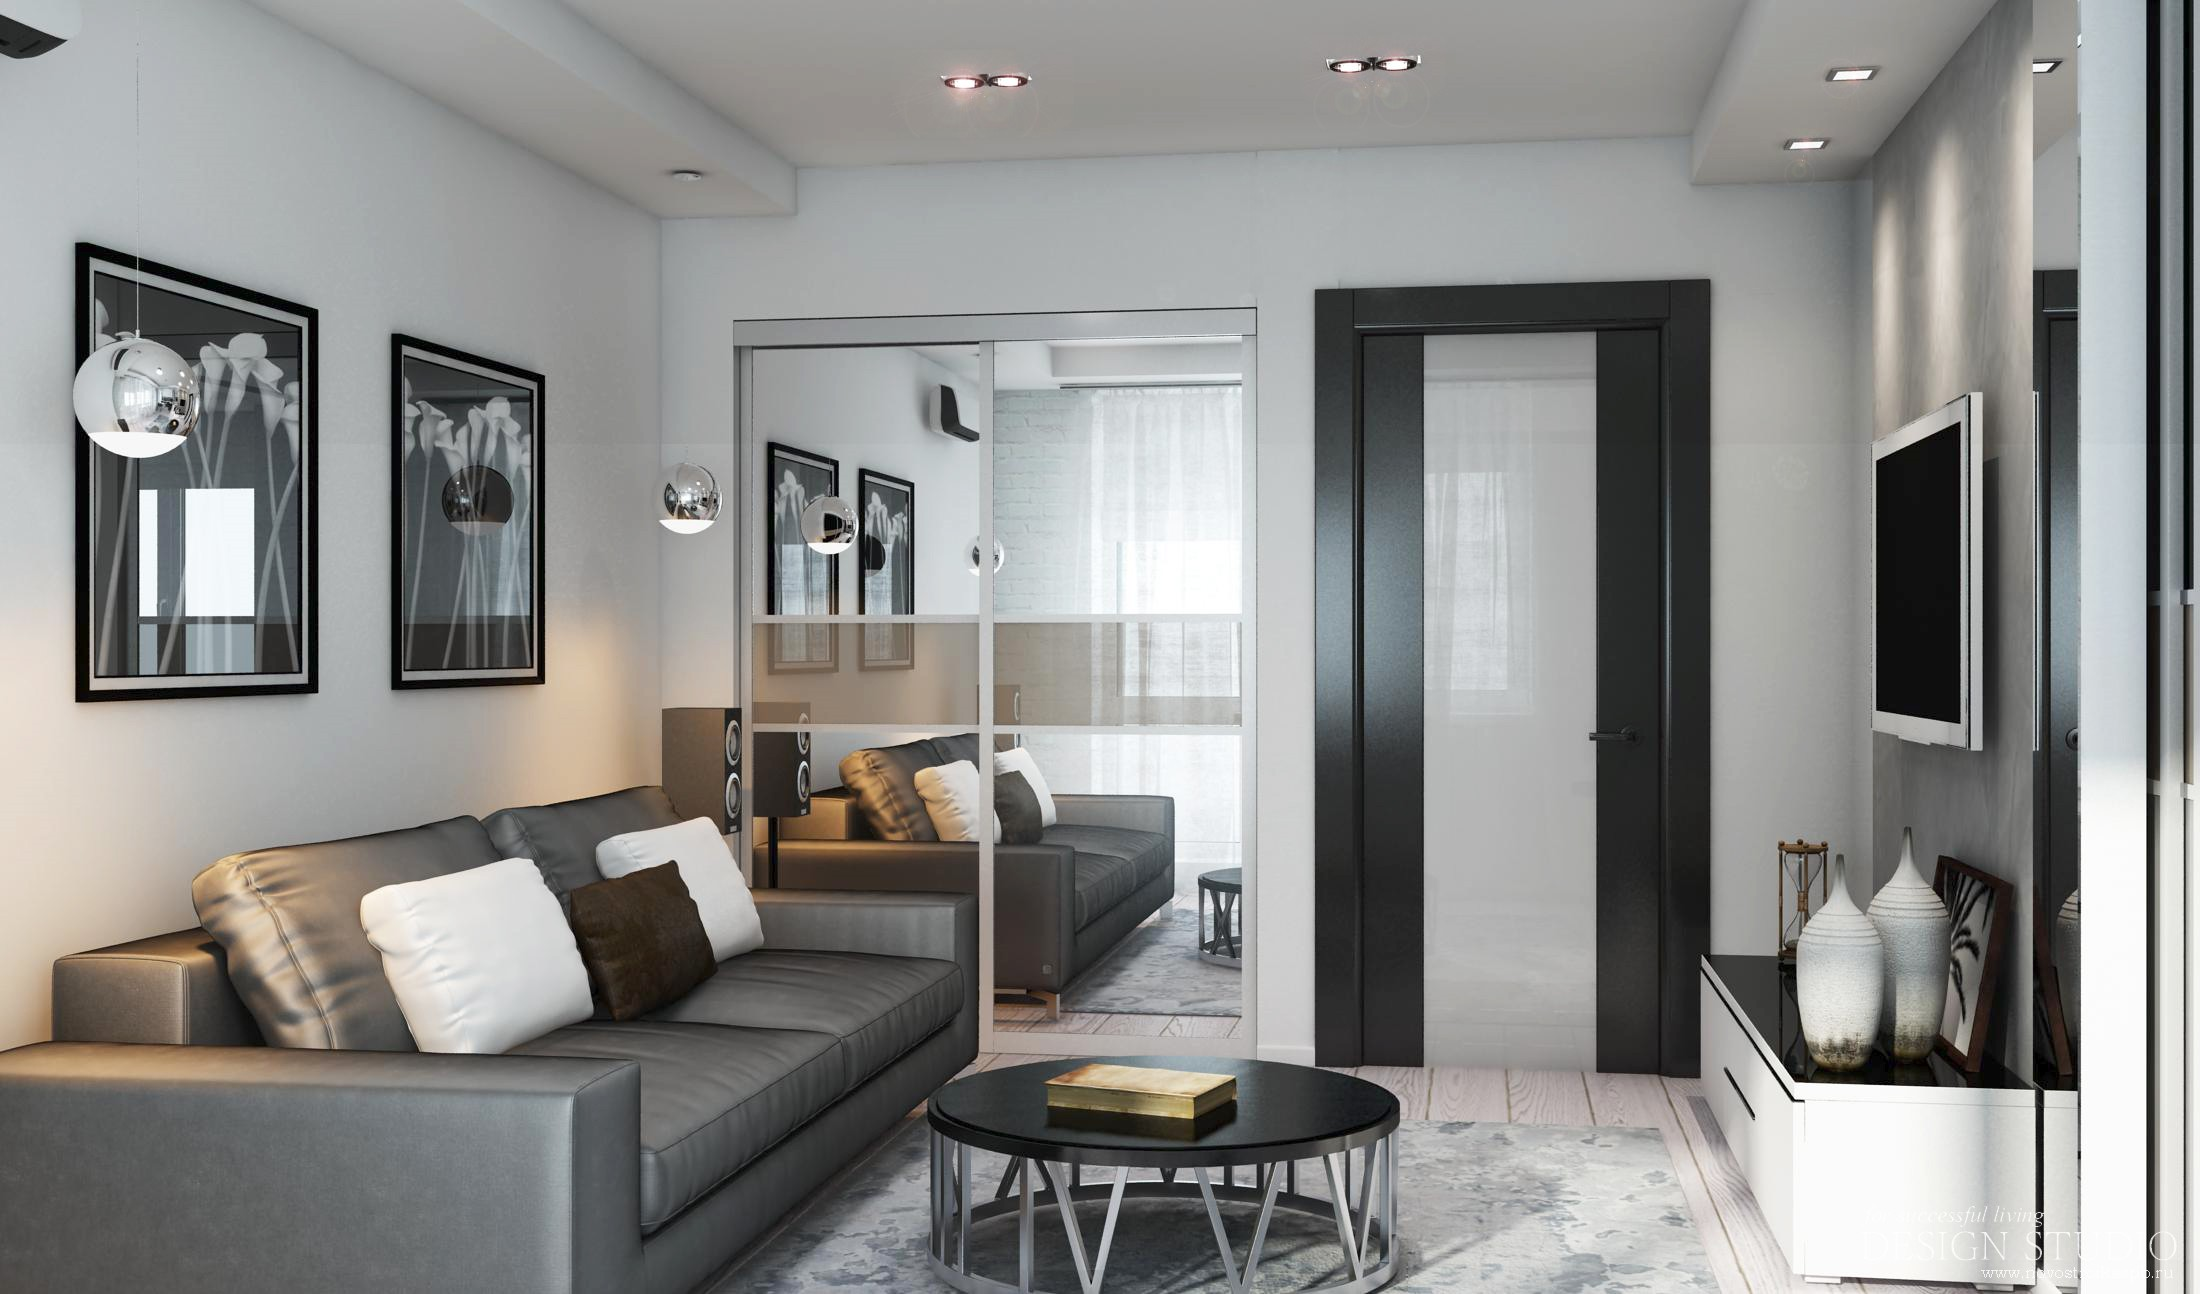 Ремонт квартир под ключ в Санкт-Петербурге: цена, фото